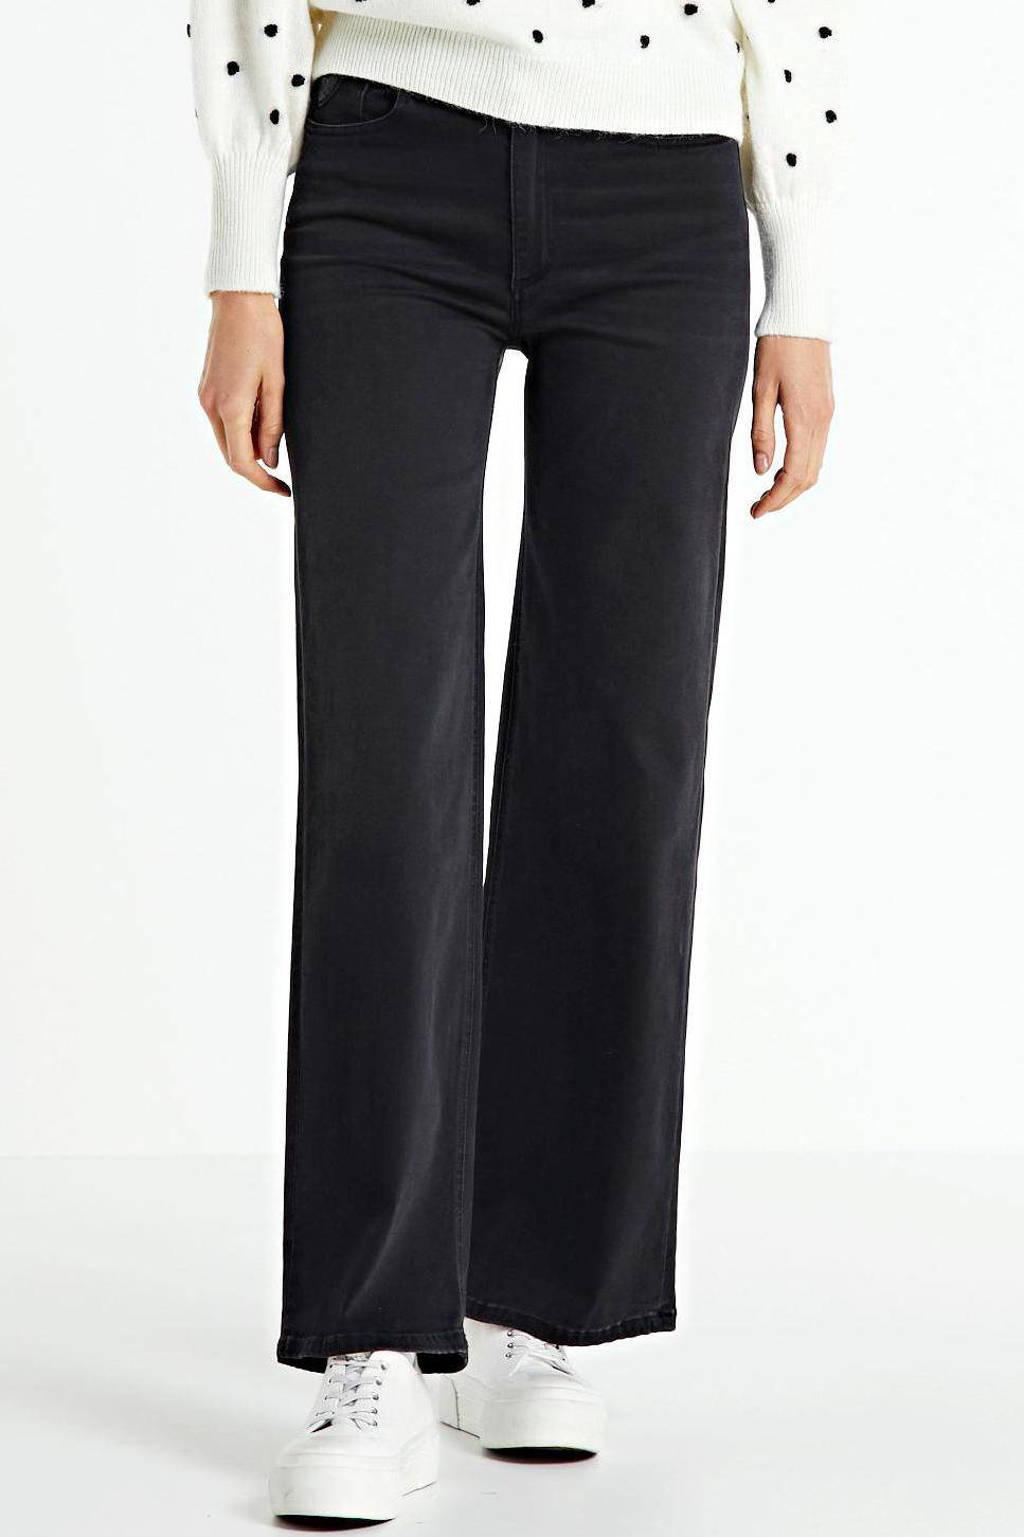 Lois high waist loose fit jeans Jossie black stone, Black Stone